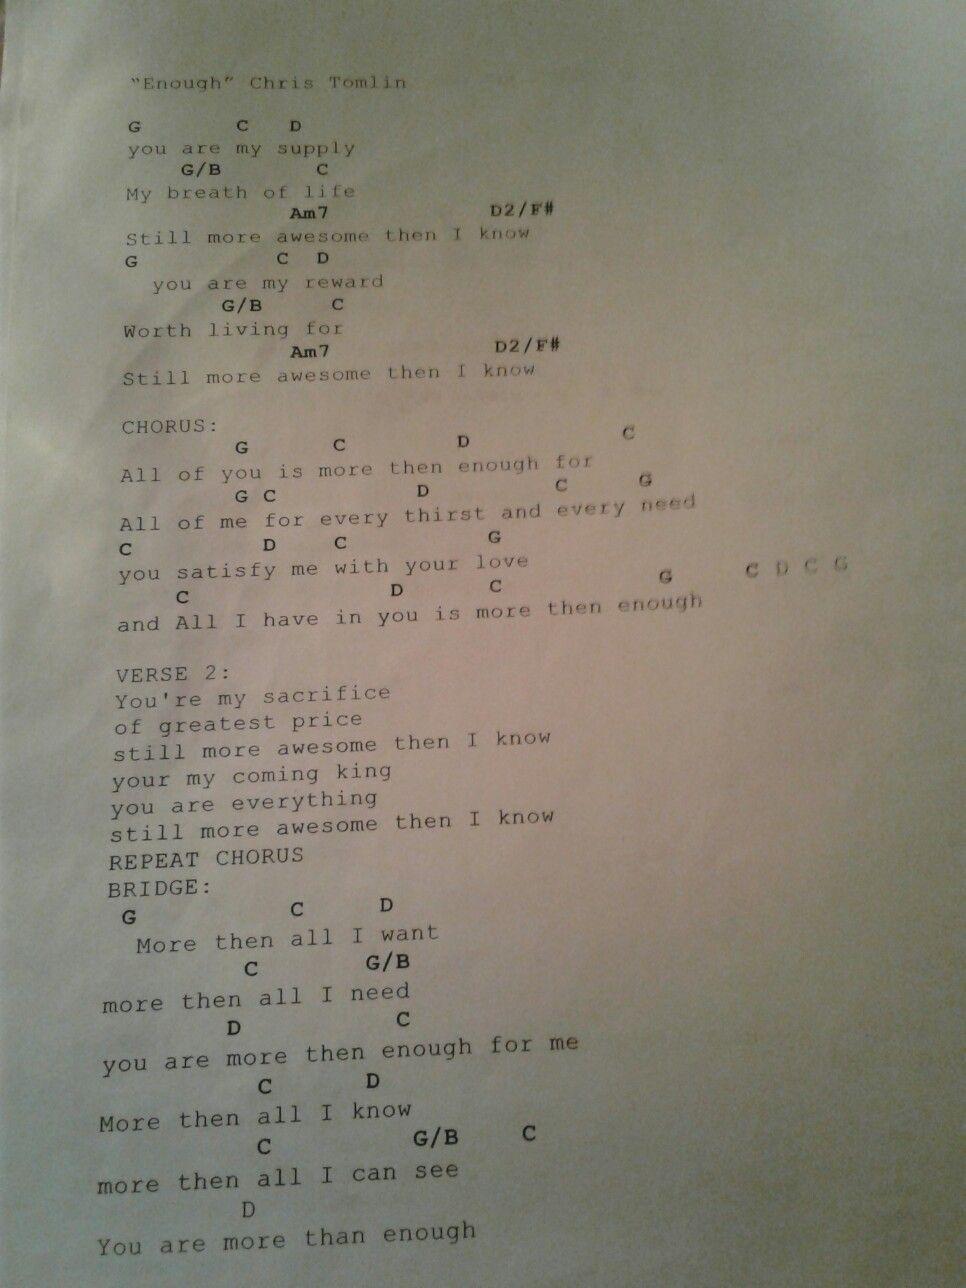 Pin By Danielle Rankin On Worship Song Guitar Chords Pinterest